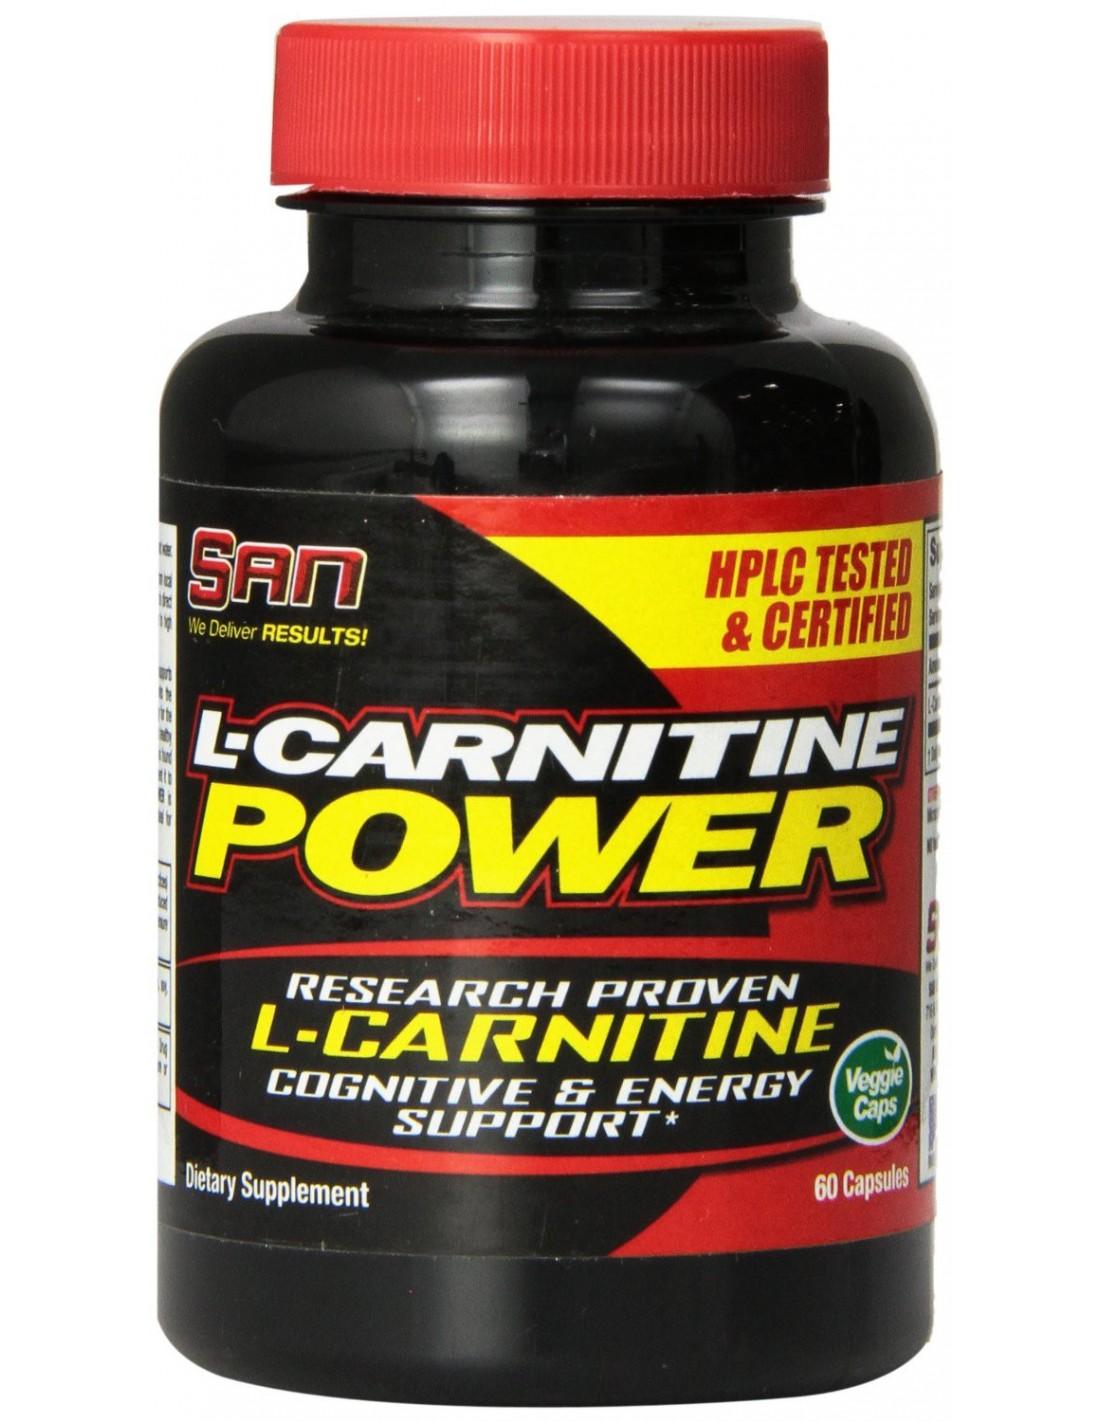 San L-Carnitine Power 60 caps